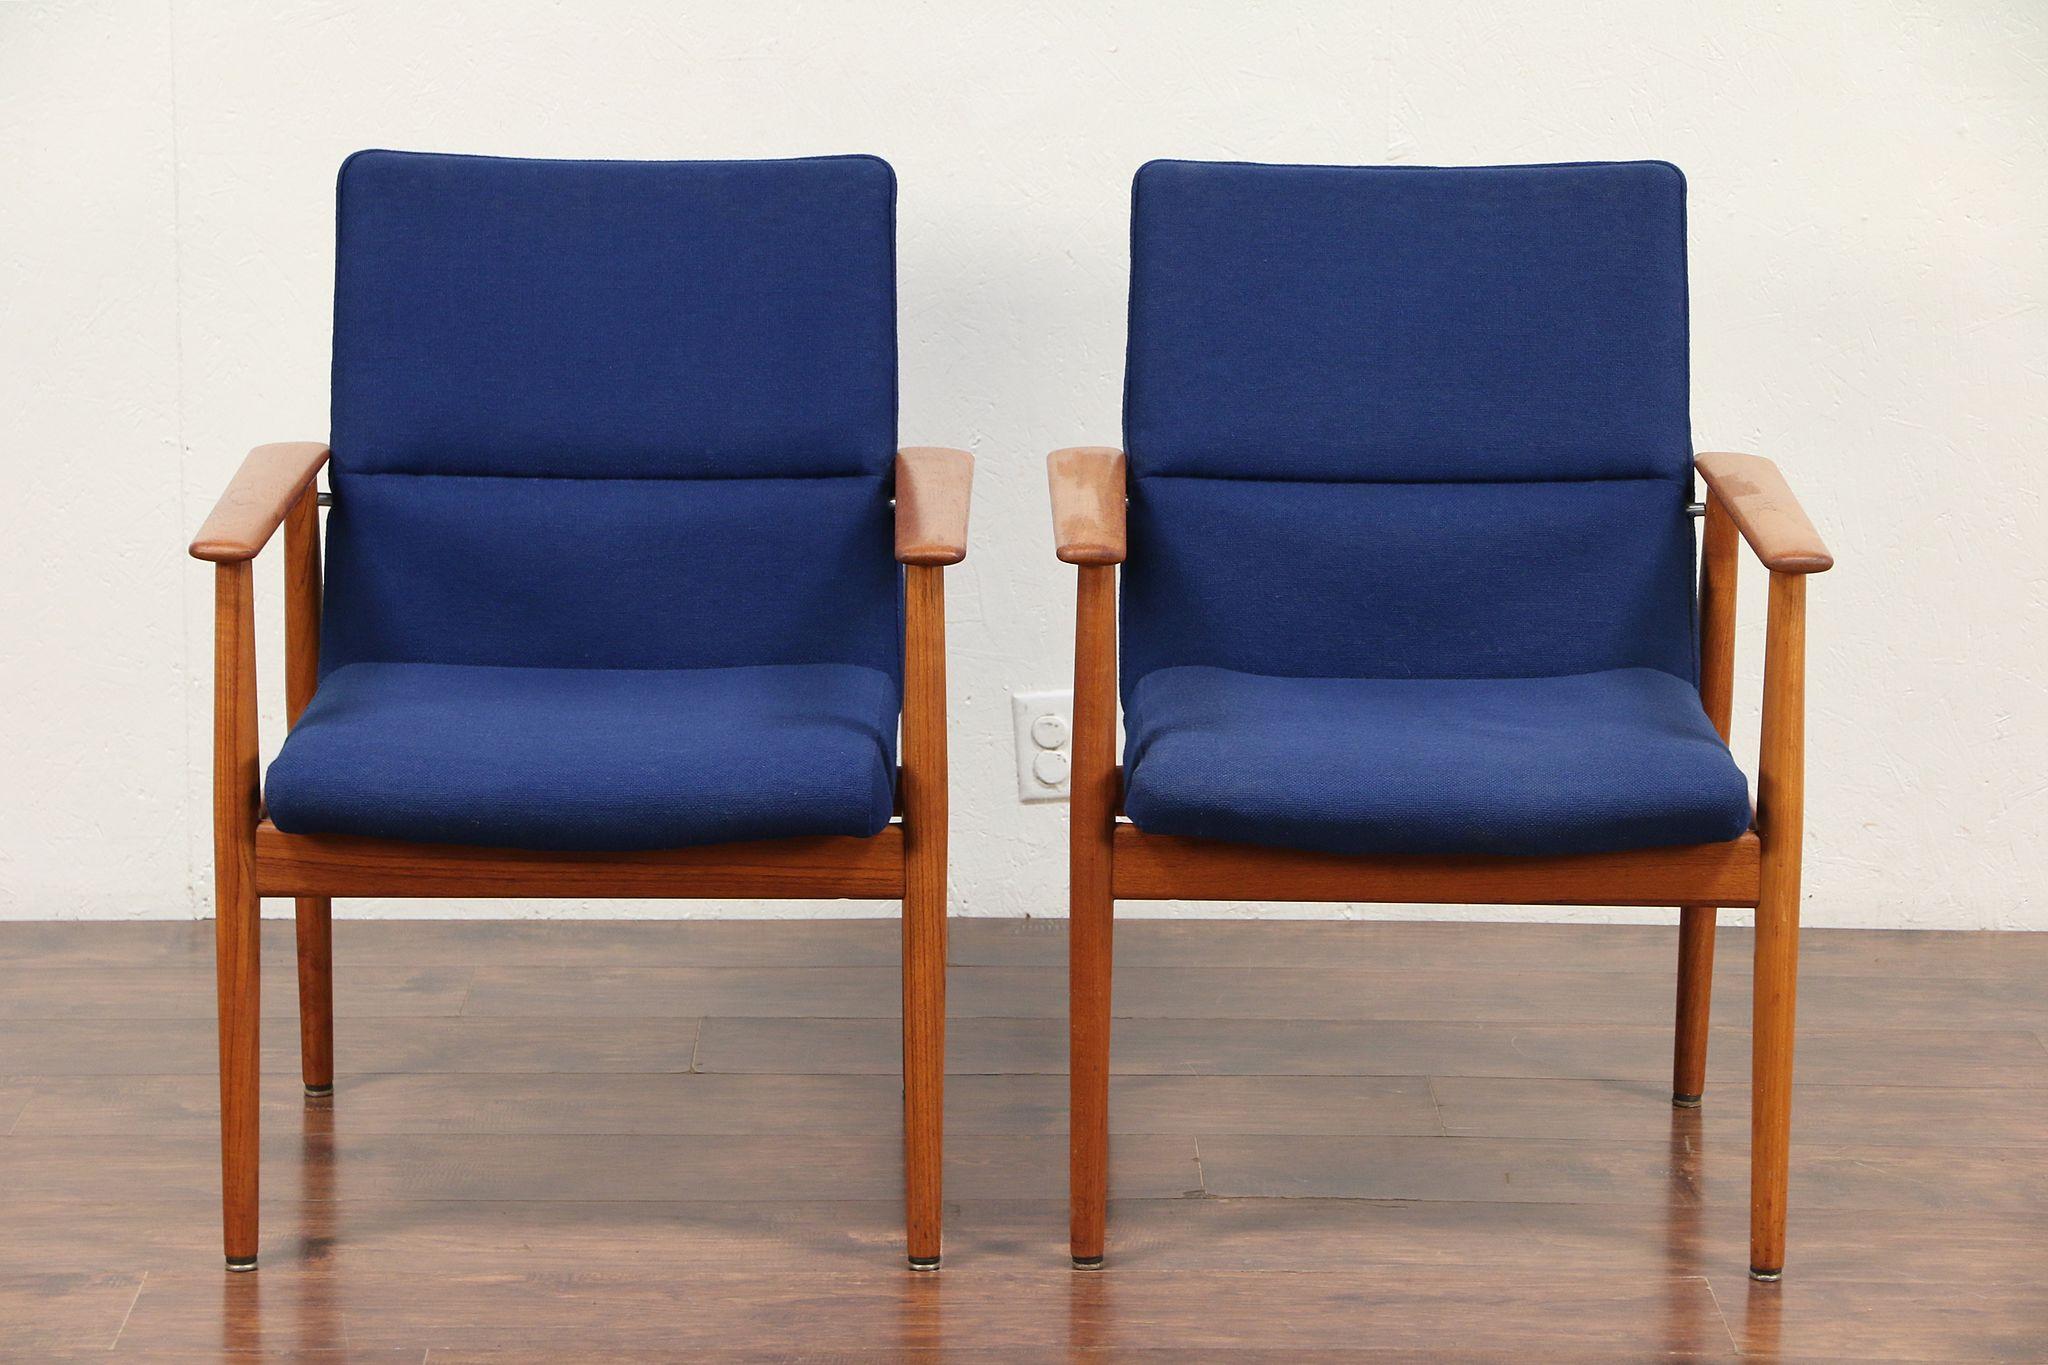 Pair Of Danish Midcentury Modern Vintage Teak Chairs Signed Sibast